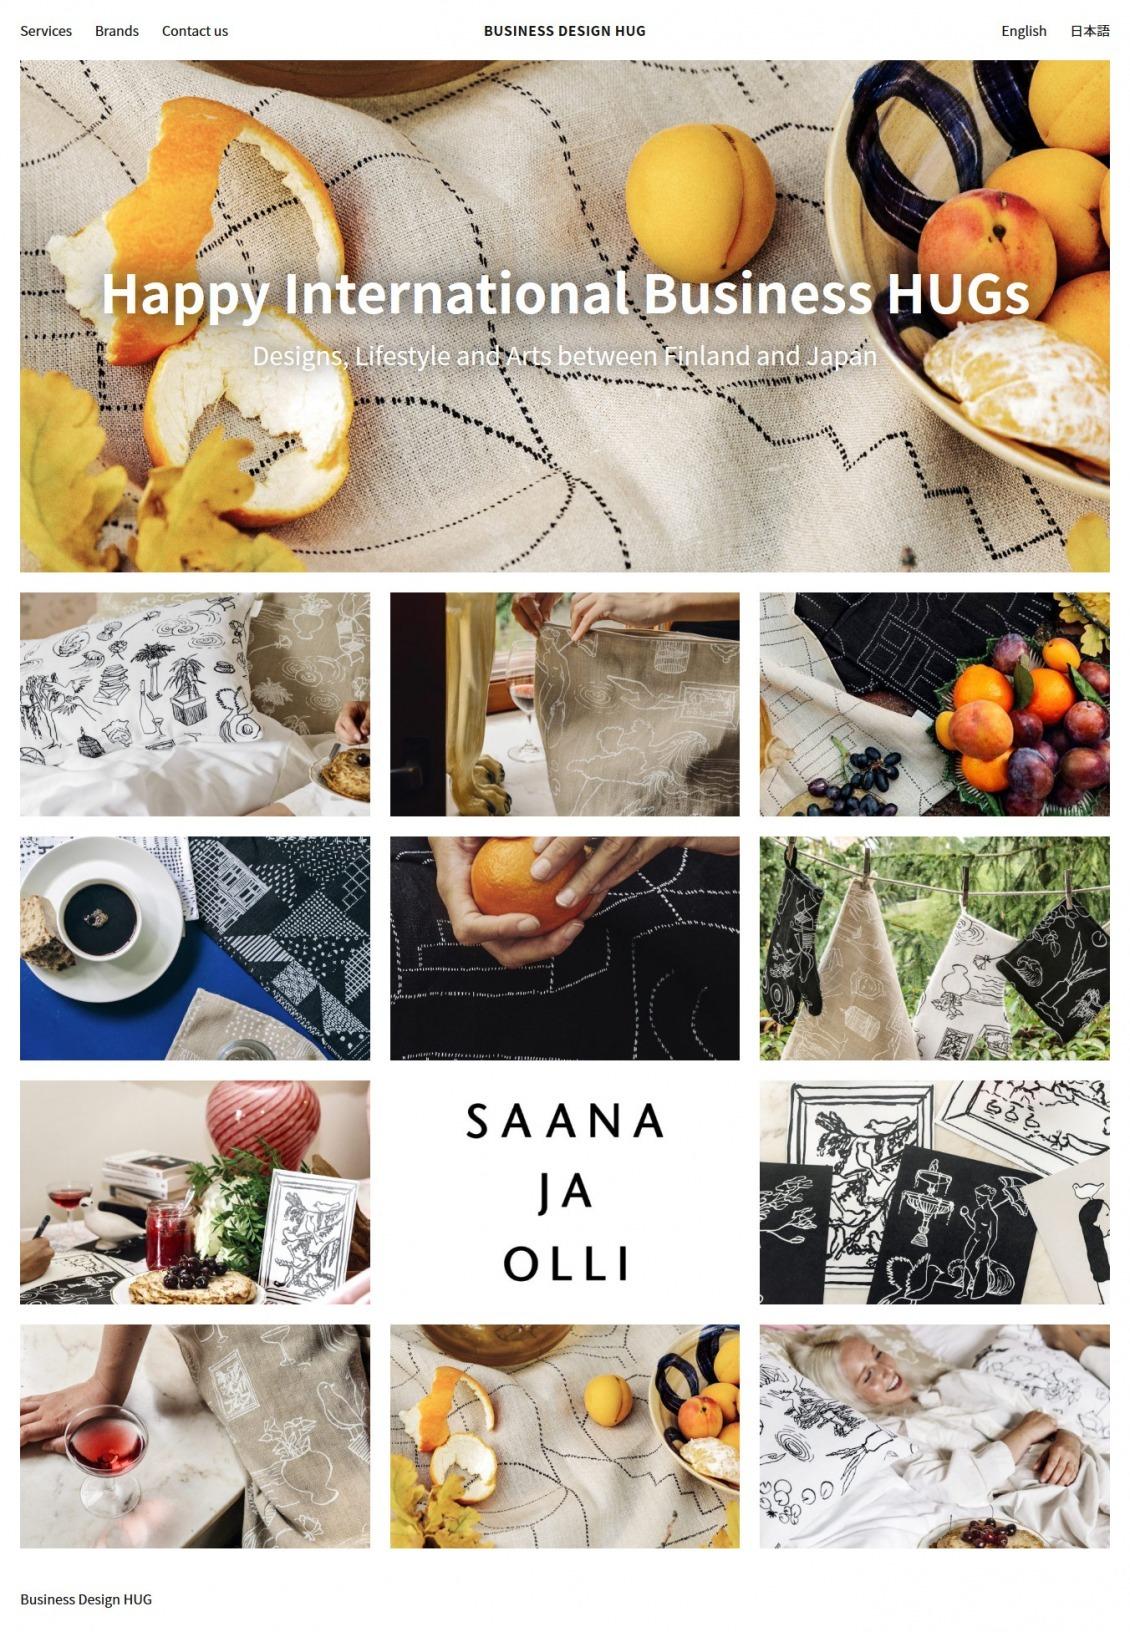 Business Design HUG